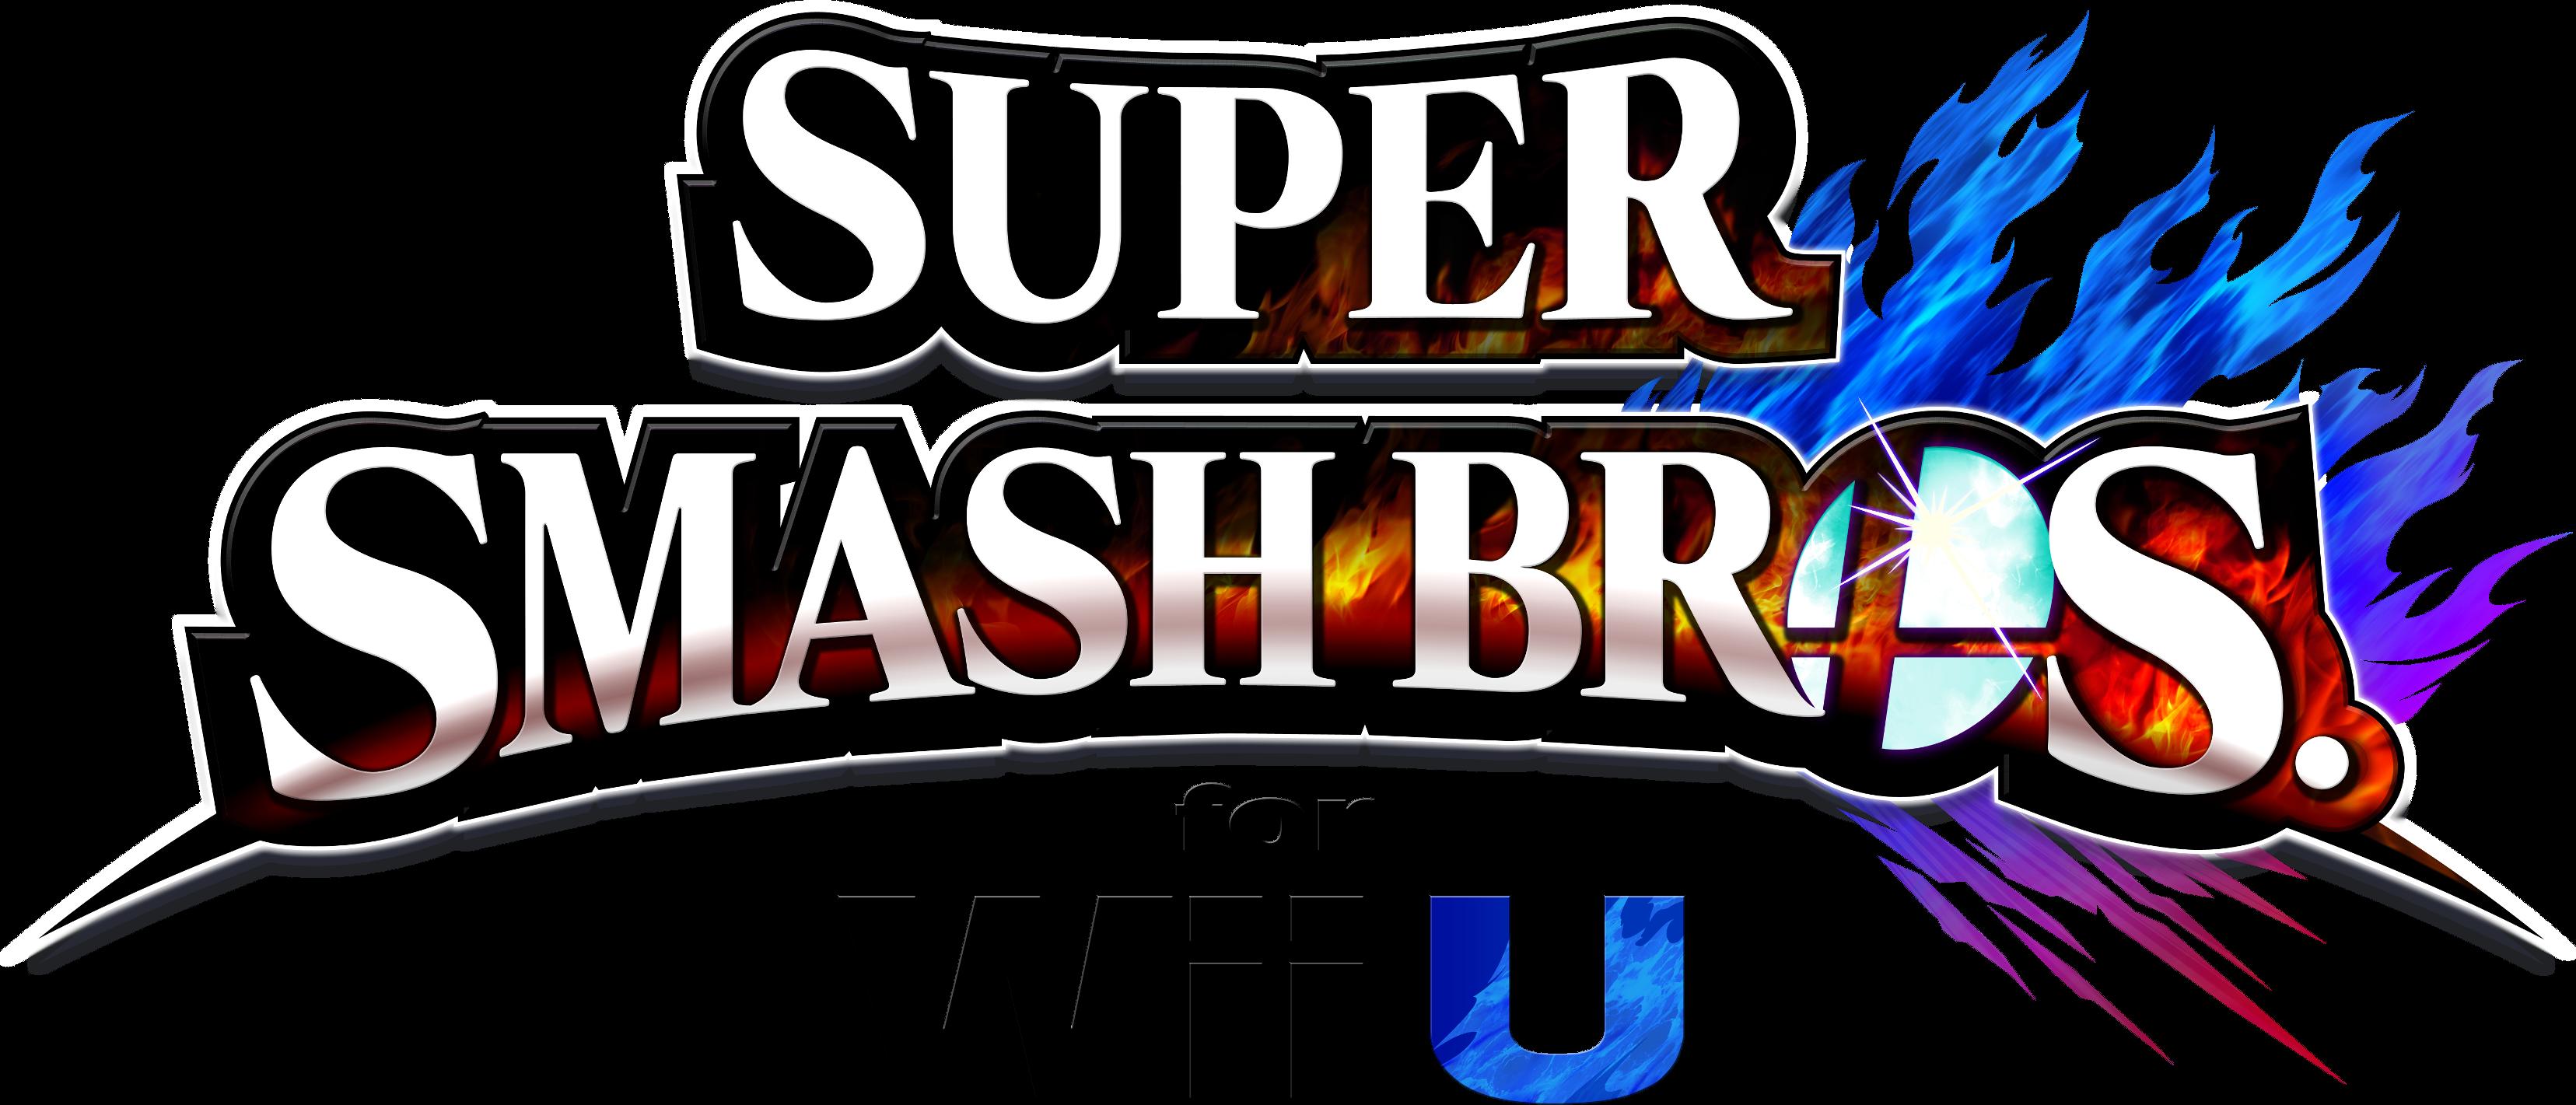 http://img2.wikia.nocookie.net/__cb20130705044923/logopedia/images/c/c1/Logo_EN_-_Super_Smash_Bros._Wii_U.png